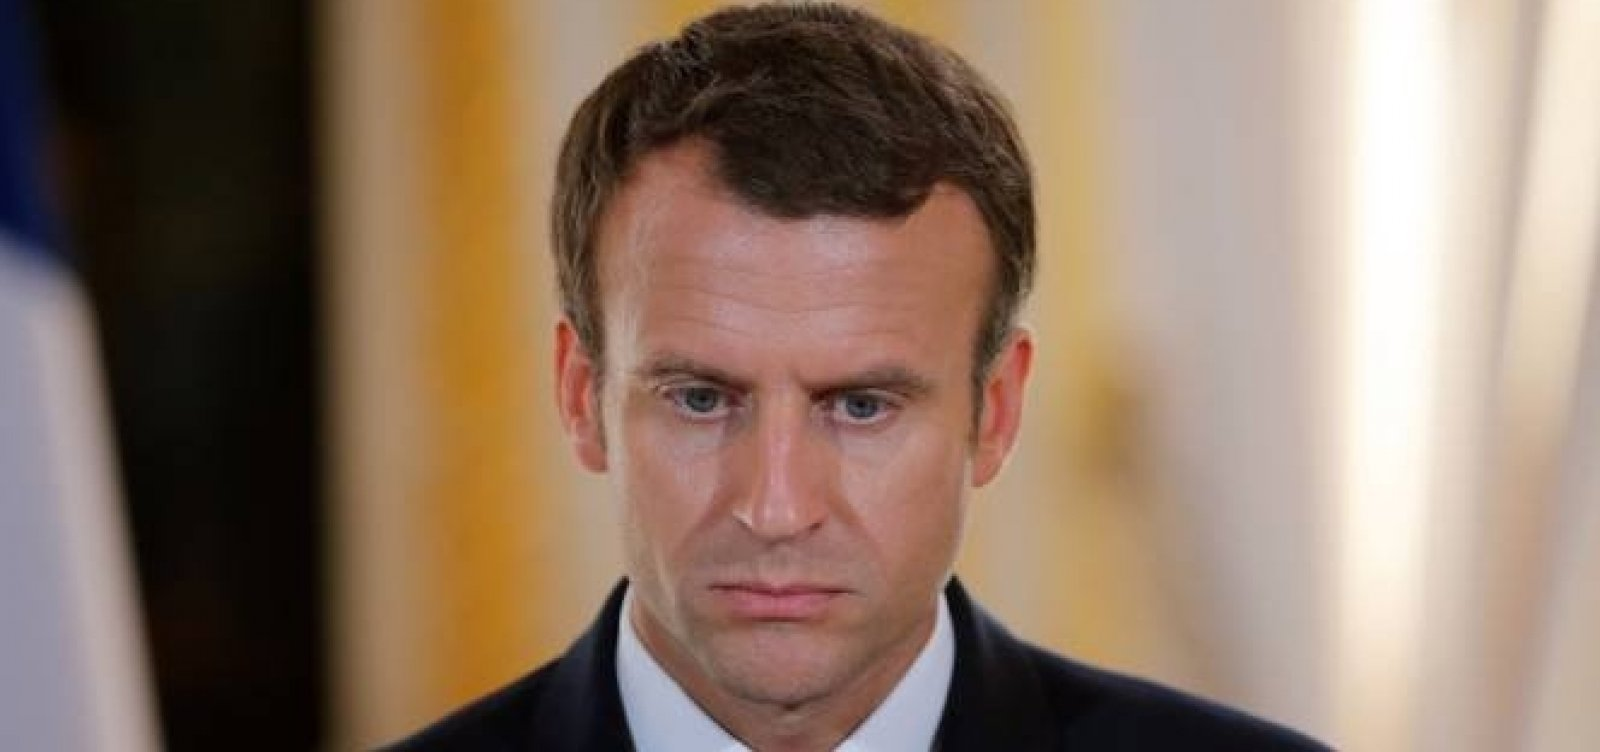 [ONGs pedem que Macron 'enterre' acordo da UE com Mercosul]